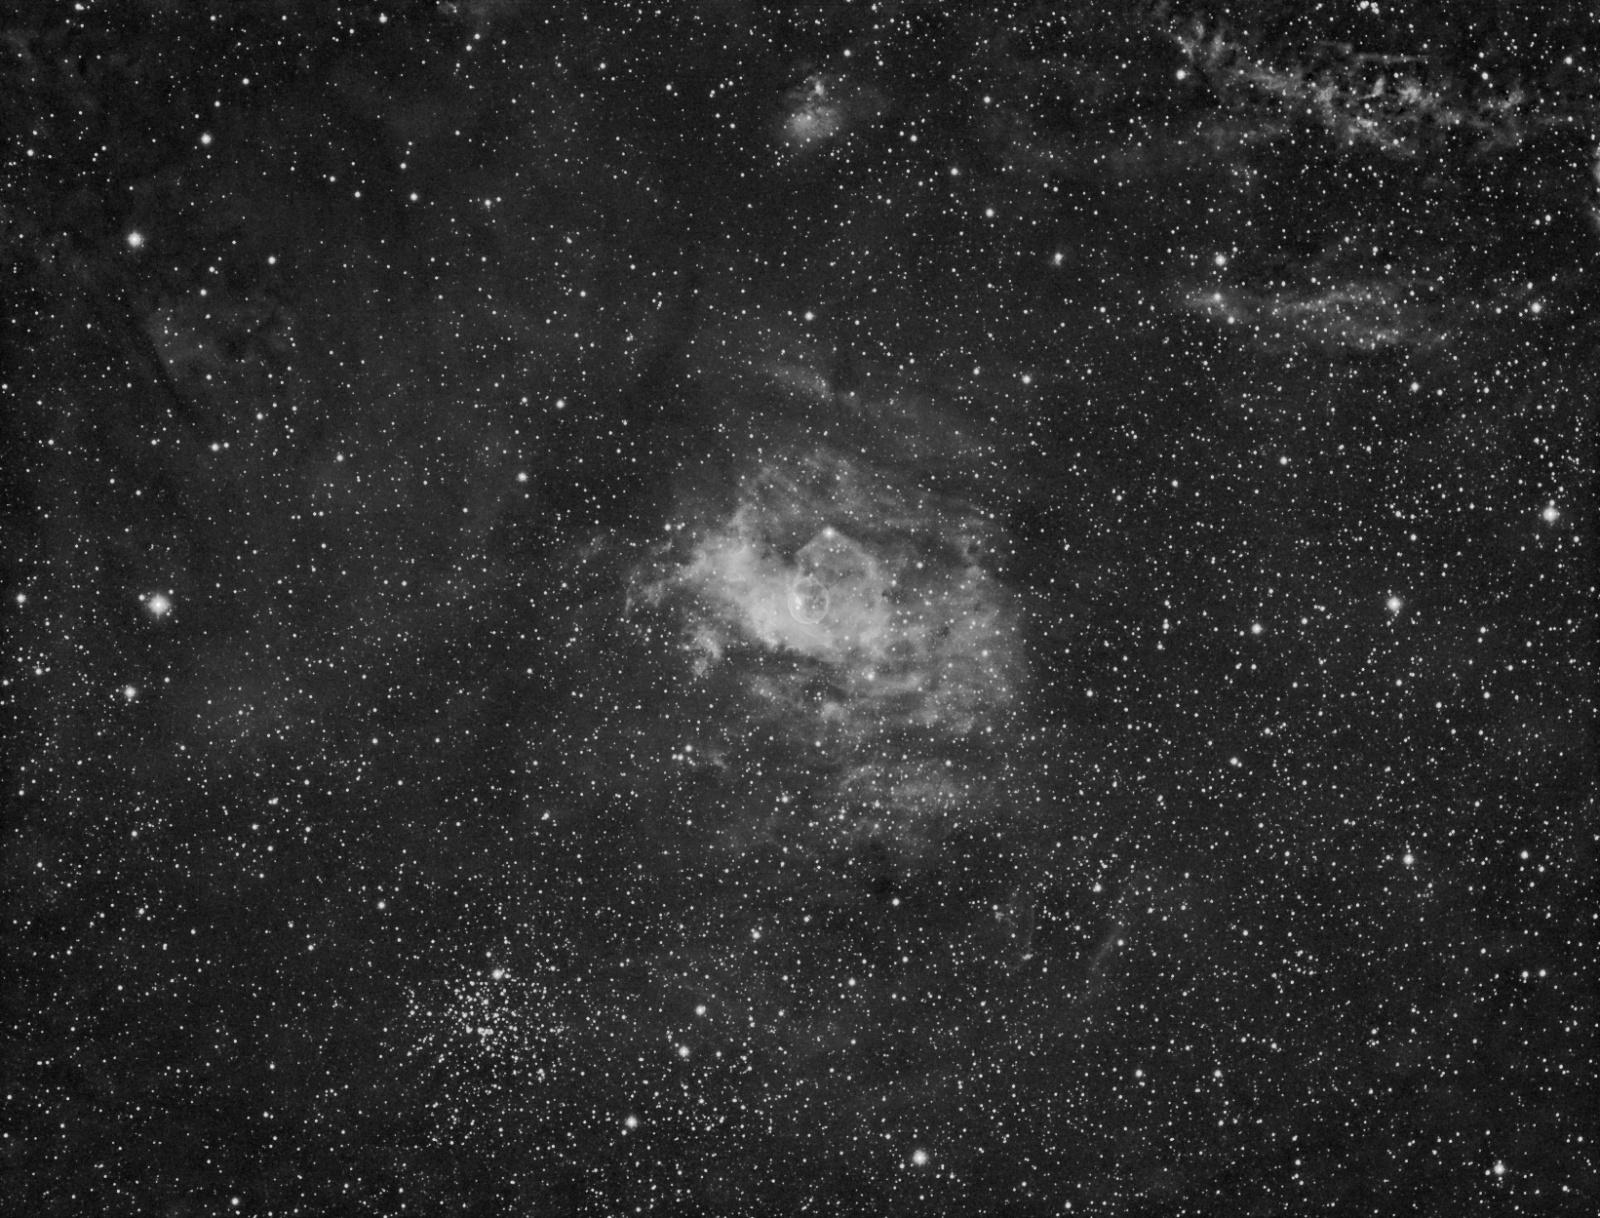 NGC_7635_35x10m.thumb.jpg.2b1f8100c7c0a207d9cd62f8e00814bd.jpg